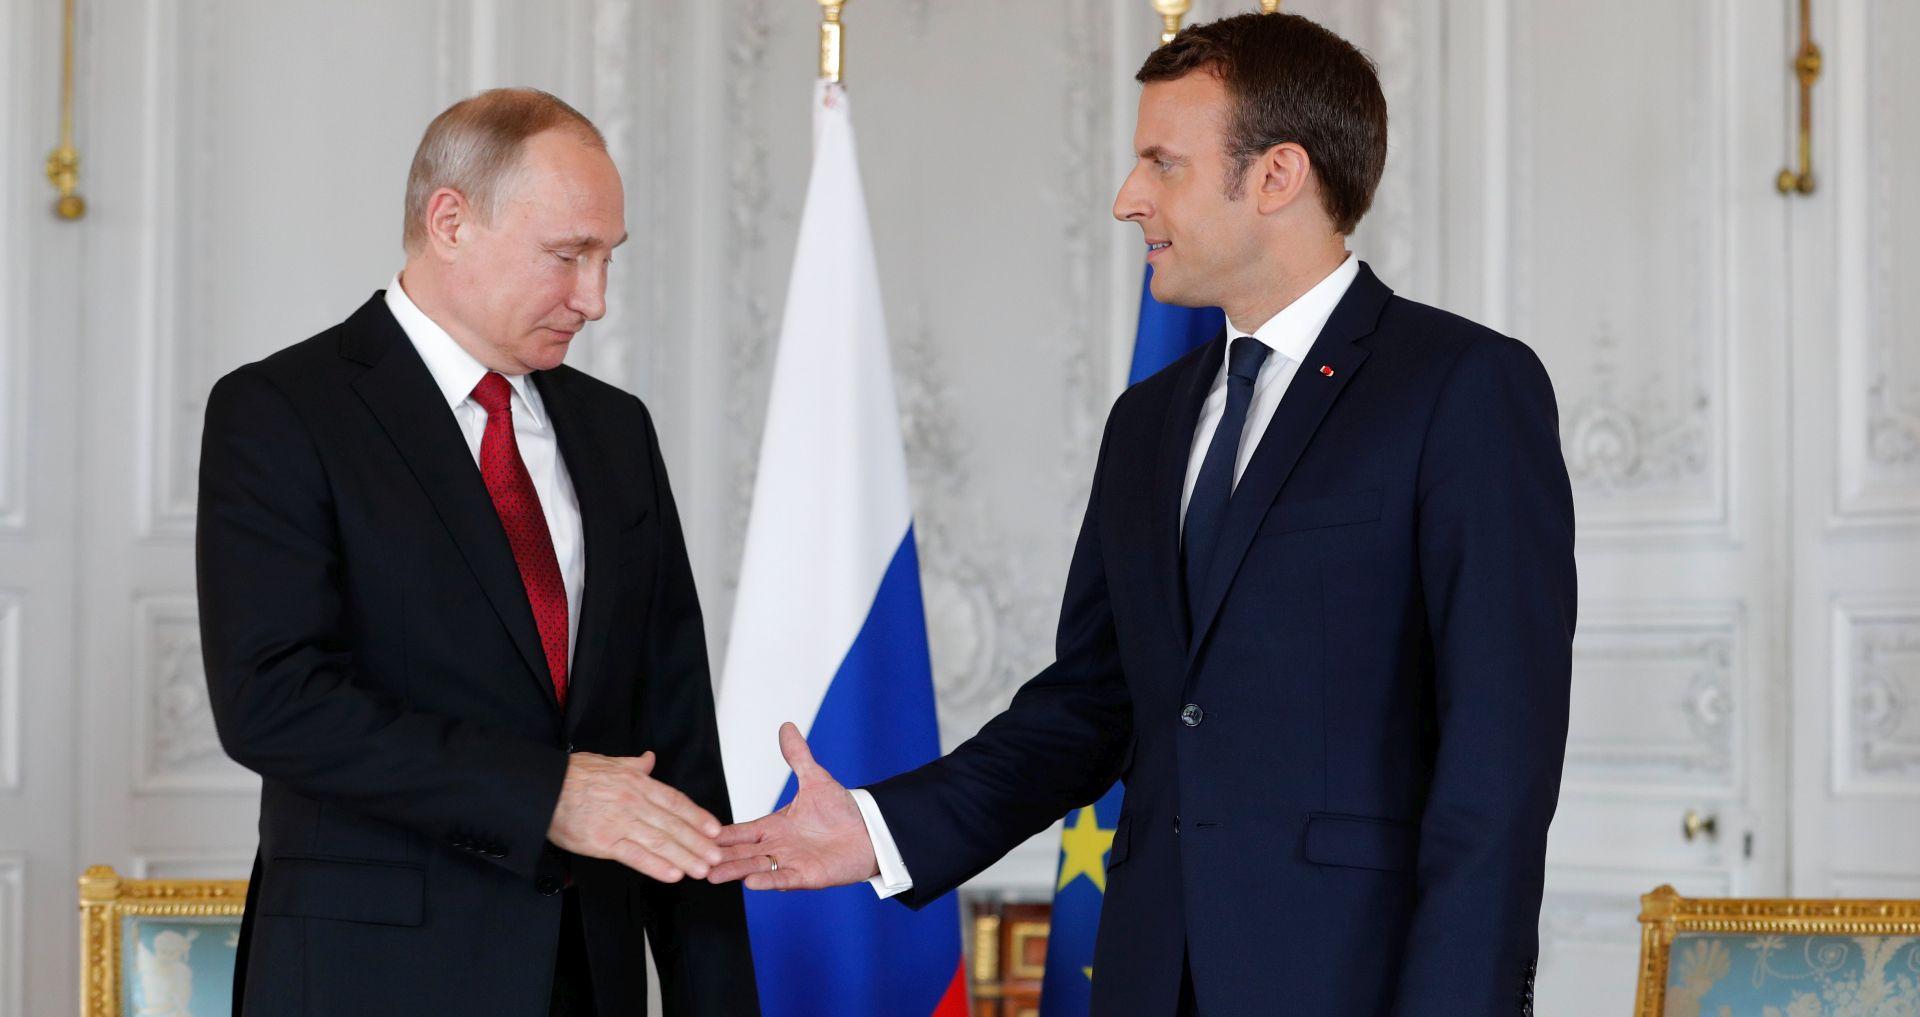 Macron se sastao s Putinom u Versaillesu